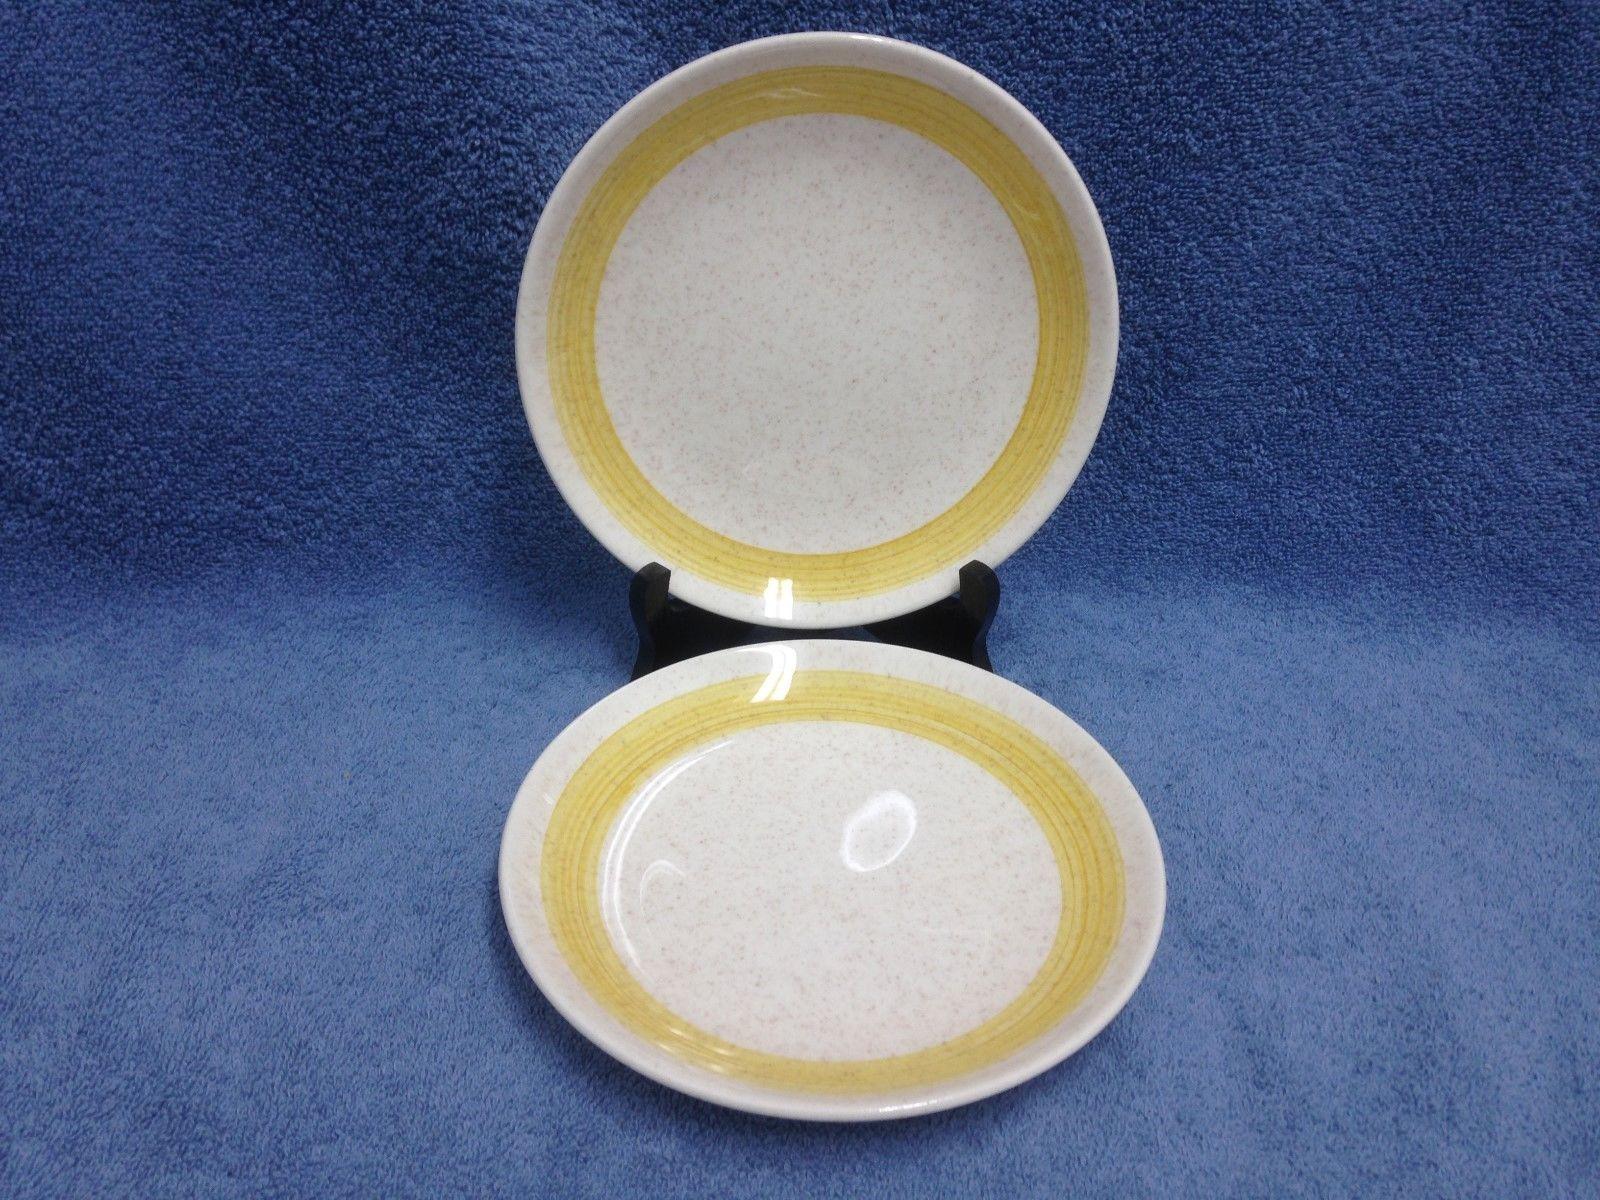 Canonsburg Pottery Co. U.S.A Sunbeam 409 Yellow (2) 7